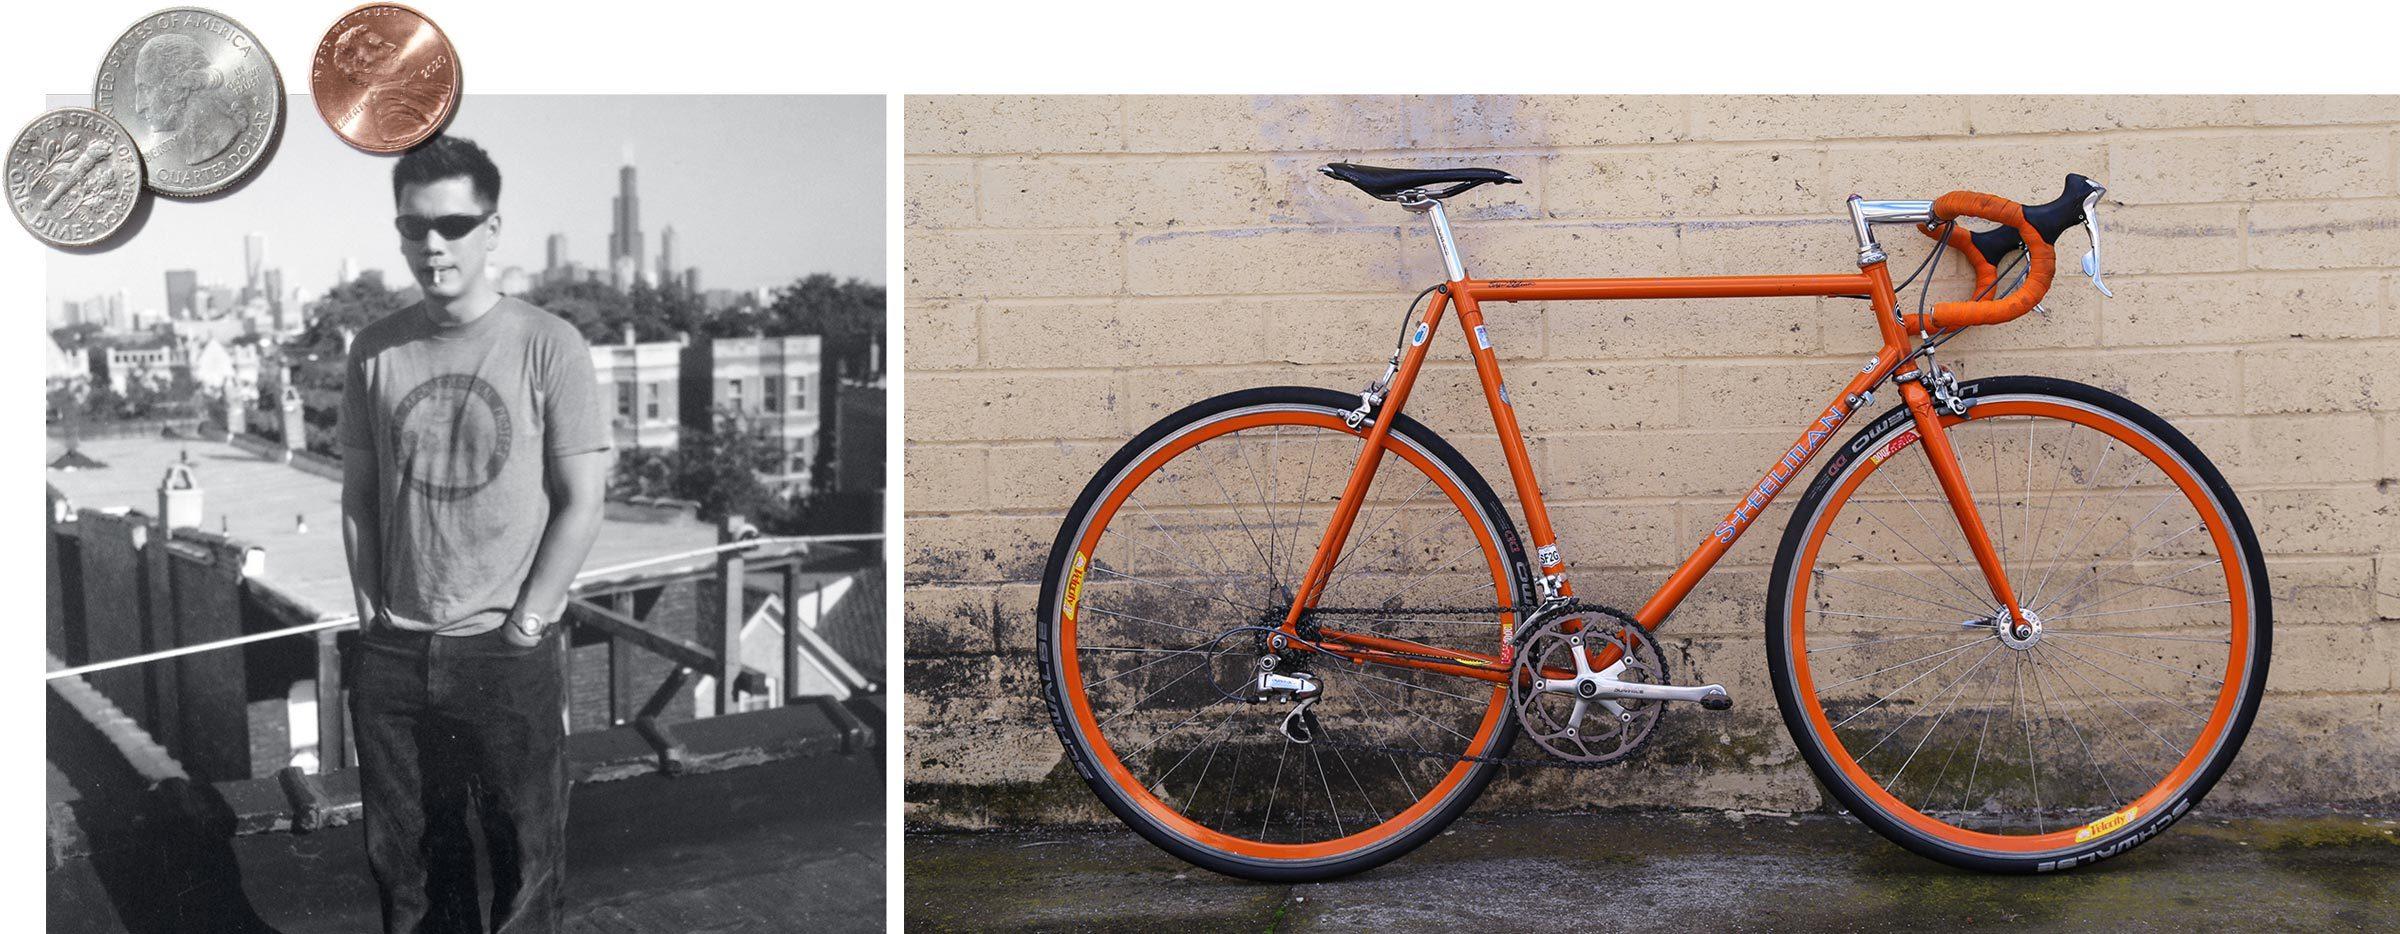 Left: Tom; right: the Steelman bike